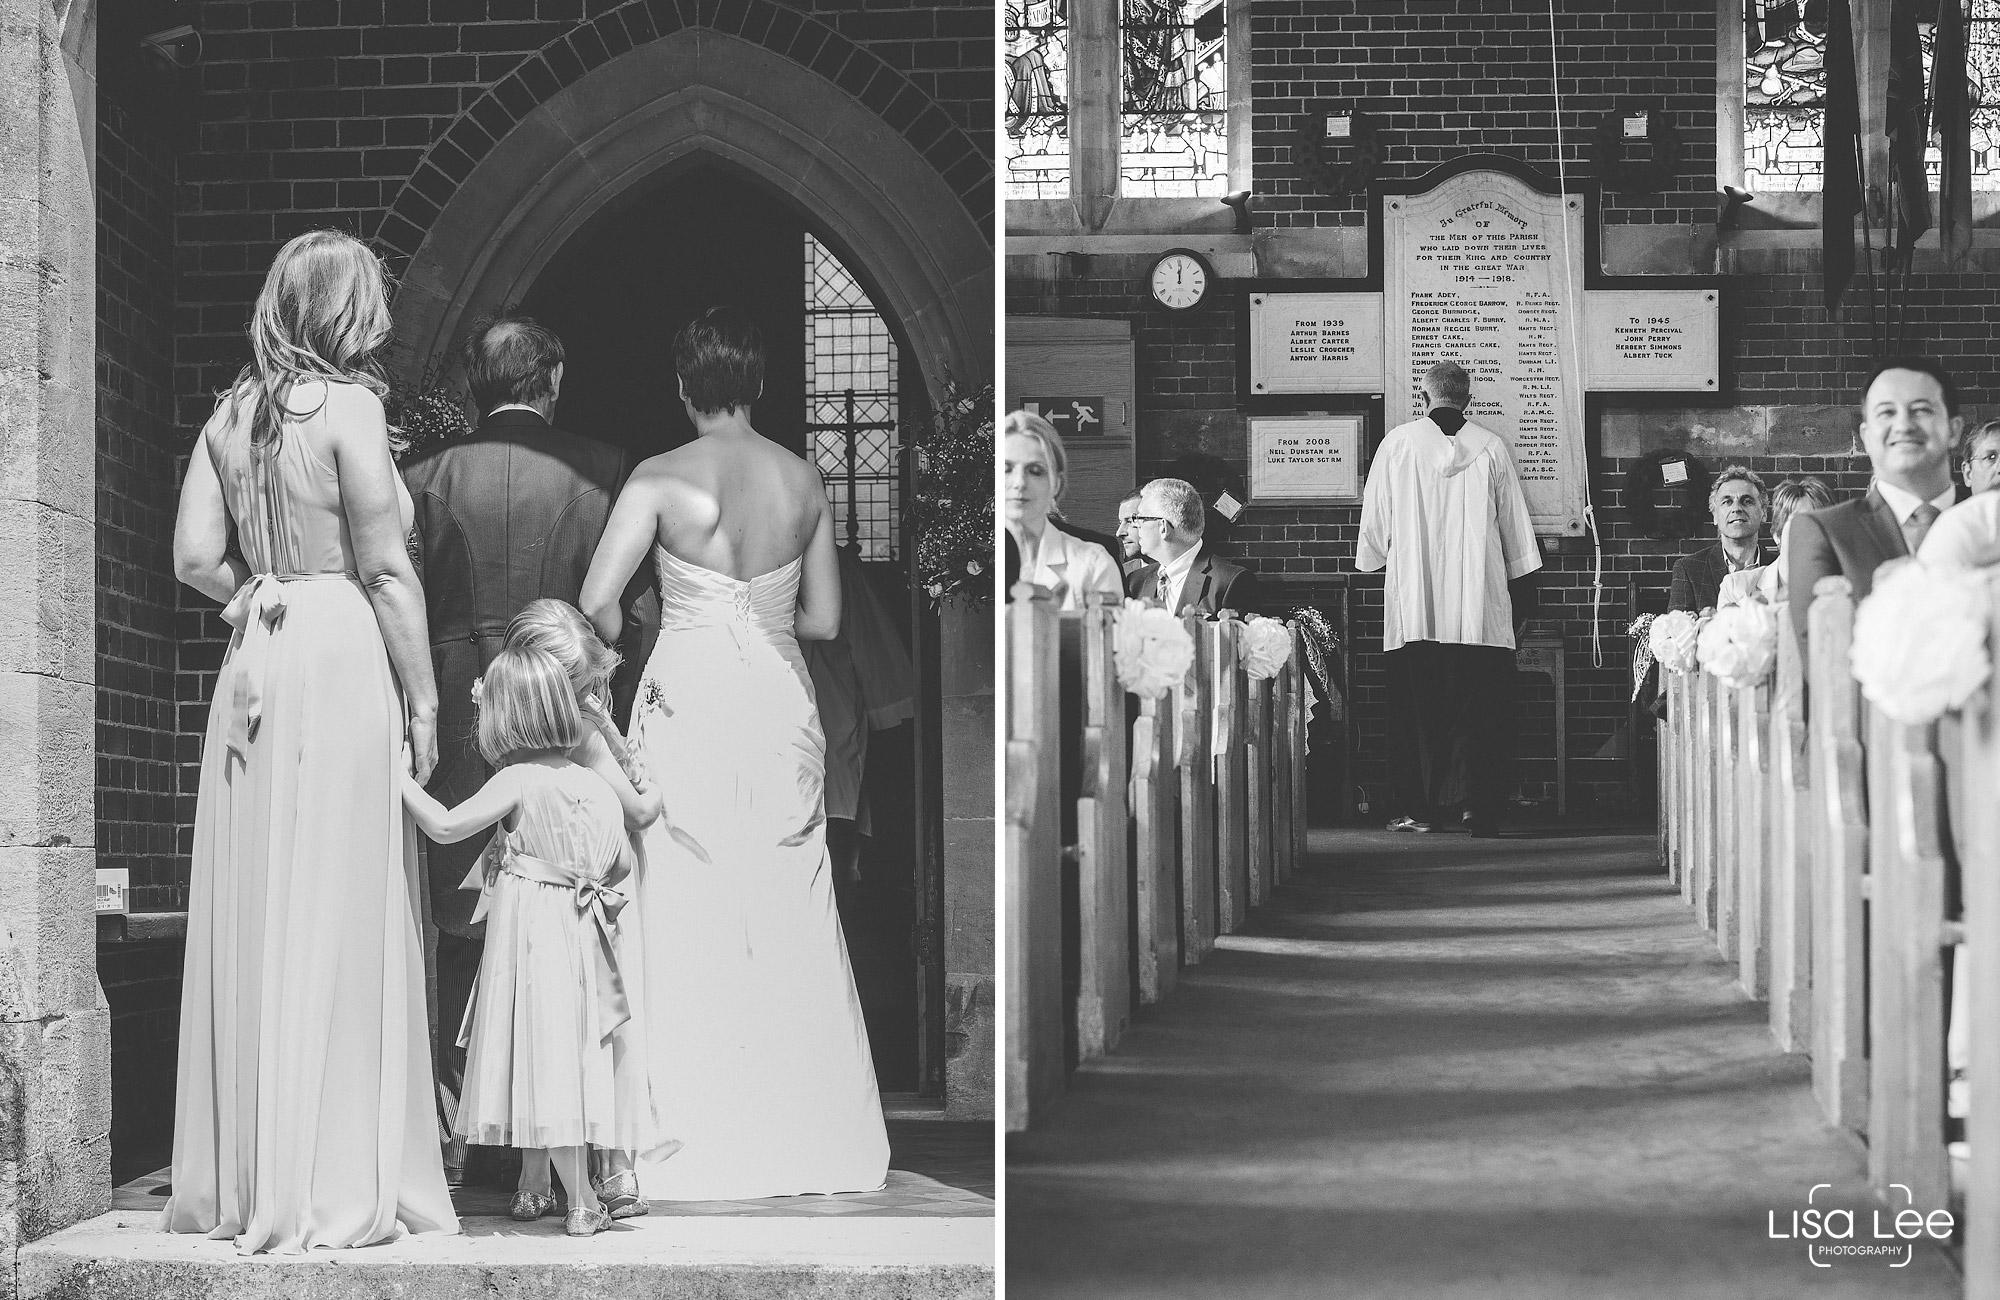 lisa-lee-wedding-photography-burton-waiting.jpg